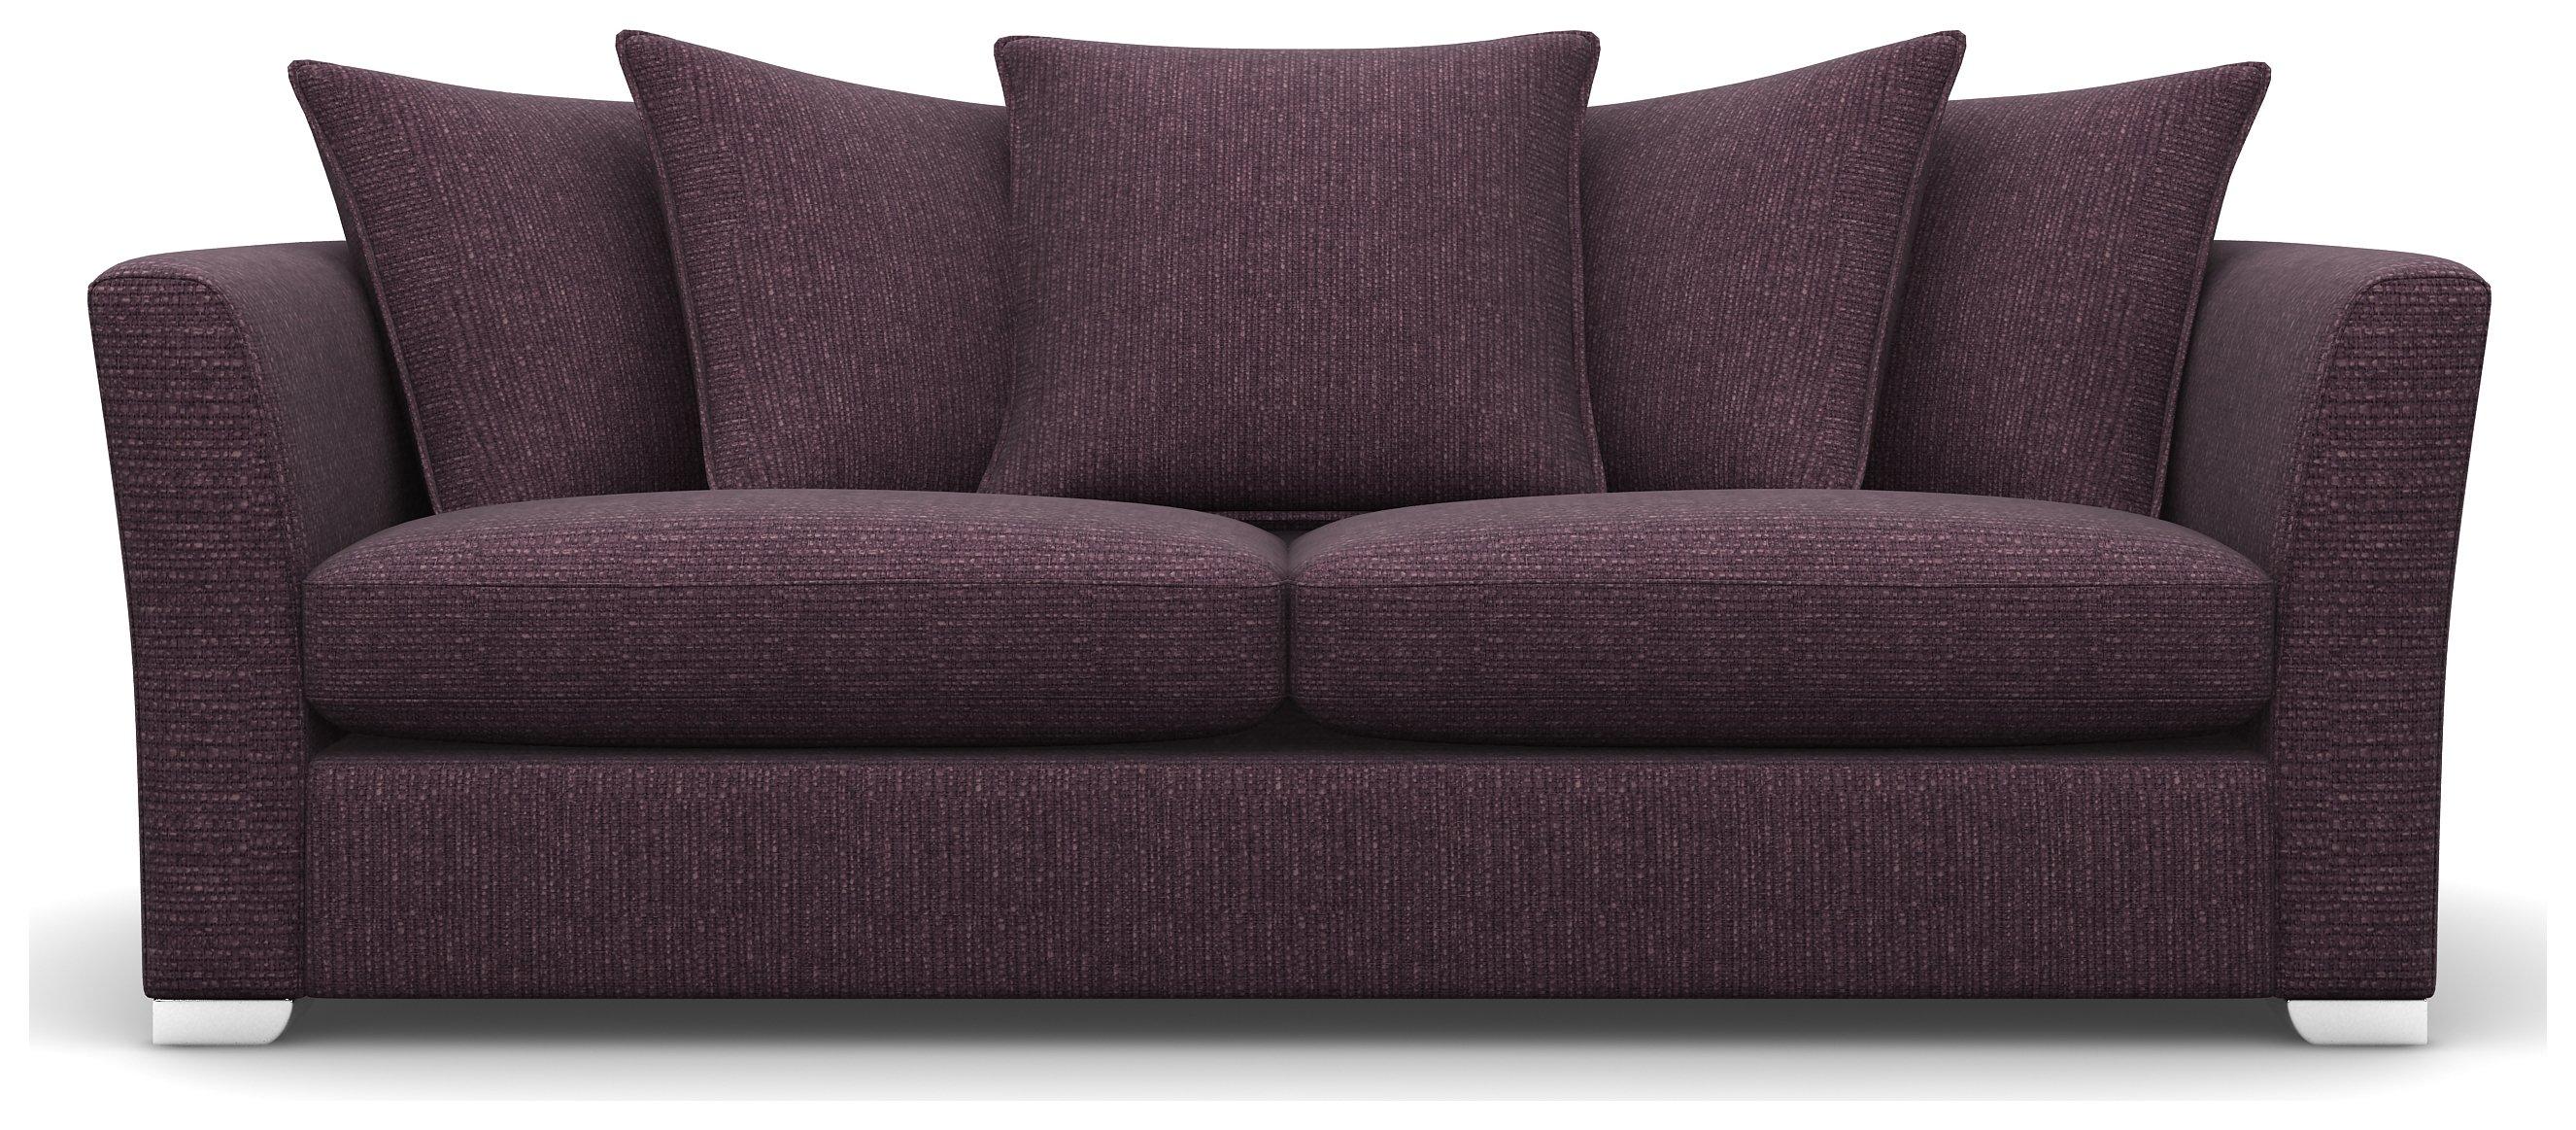 Heart of House Libby 3 Seater Fabric Sofa - Hortsenia + White Legs